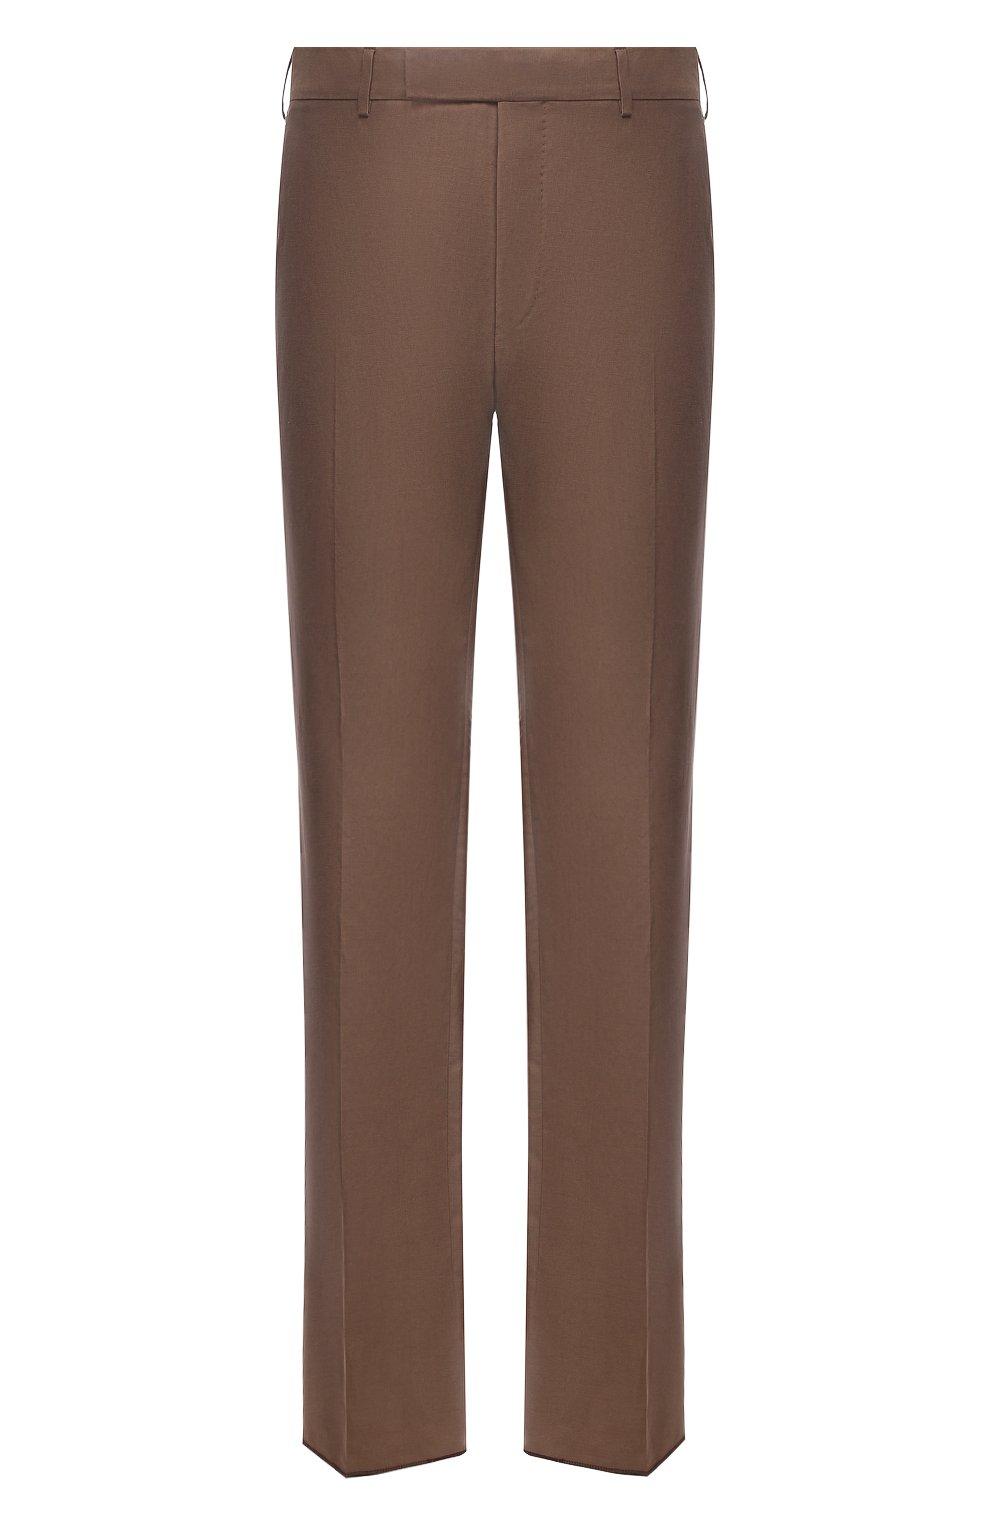 Мужские брюки из шелка и льна TOM FORD коричневого цвета, арт. 976R15/759242   Фото 1